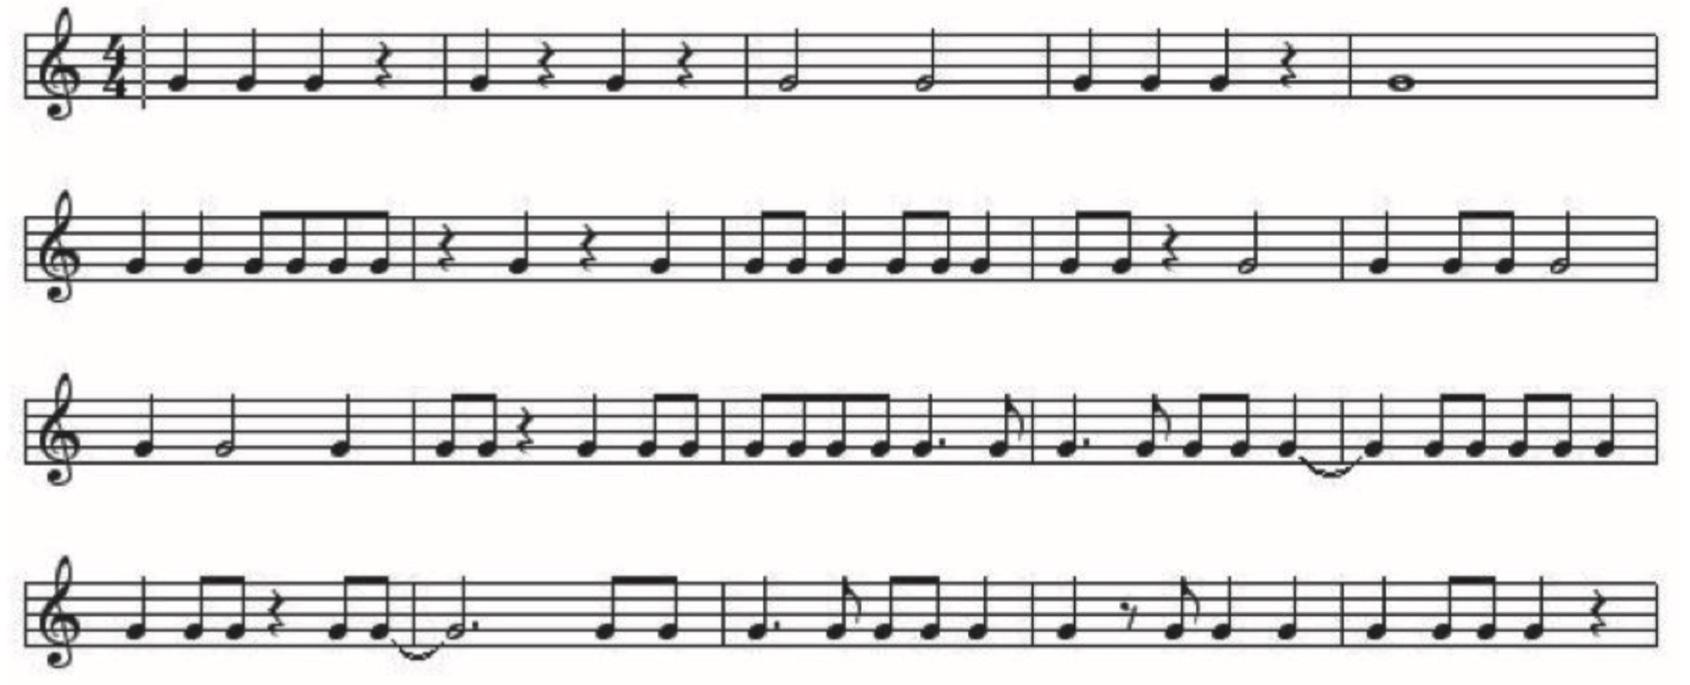 1. Rhythmic sight reading: Examples 1.1-1.4